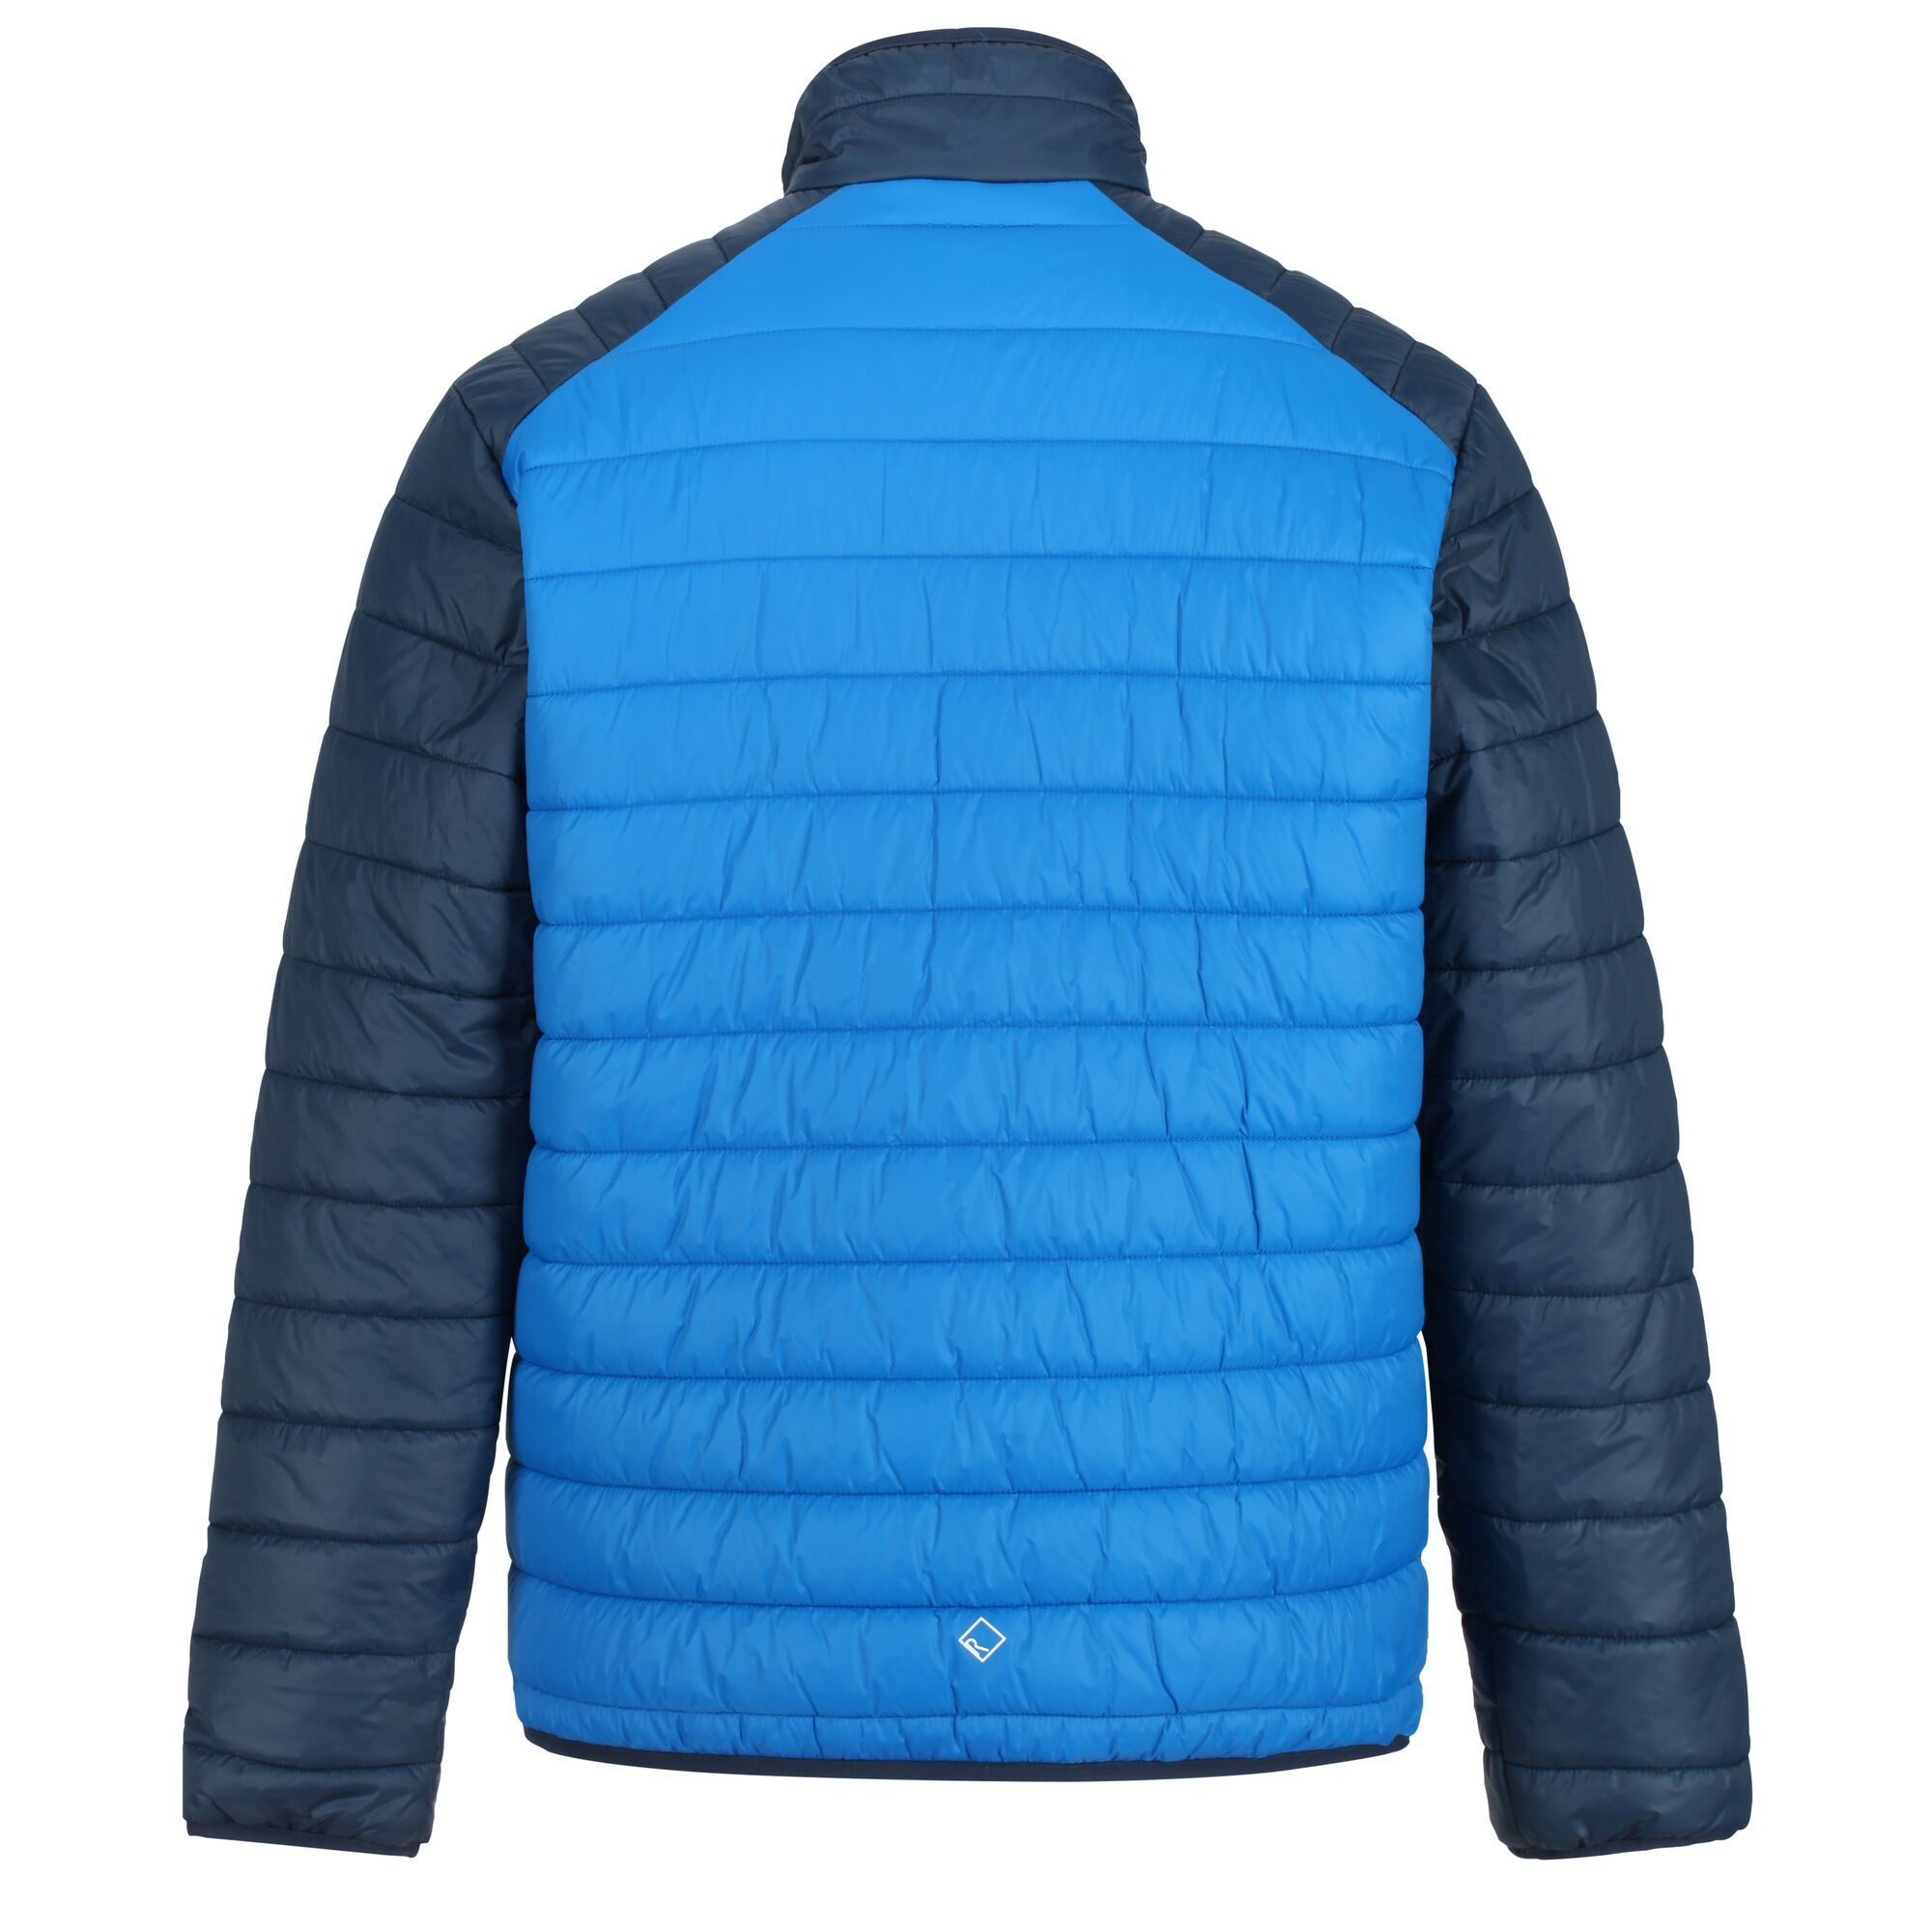 Regatta Mens Freezeway II Insulated Jacket (Imperial Blue/Nightfall Navy)